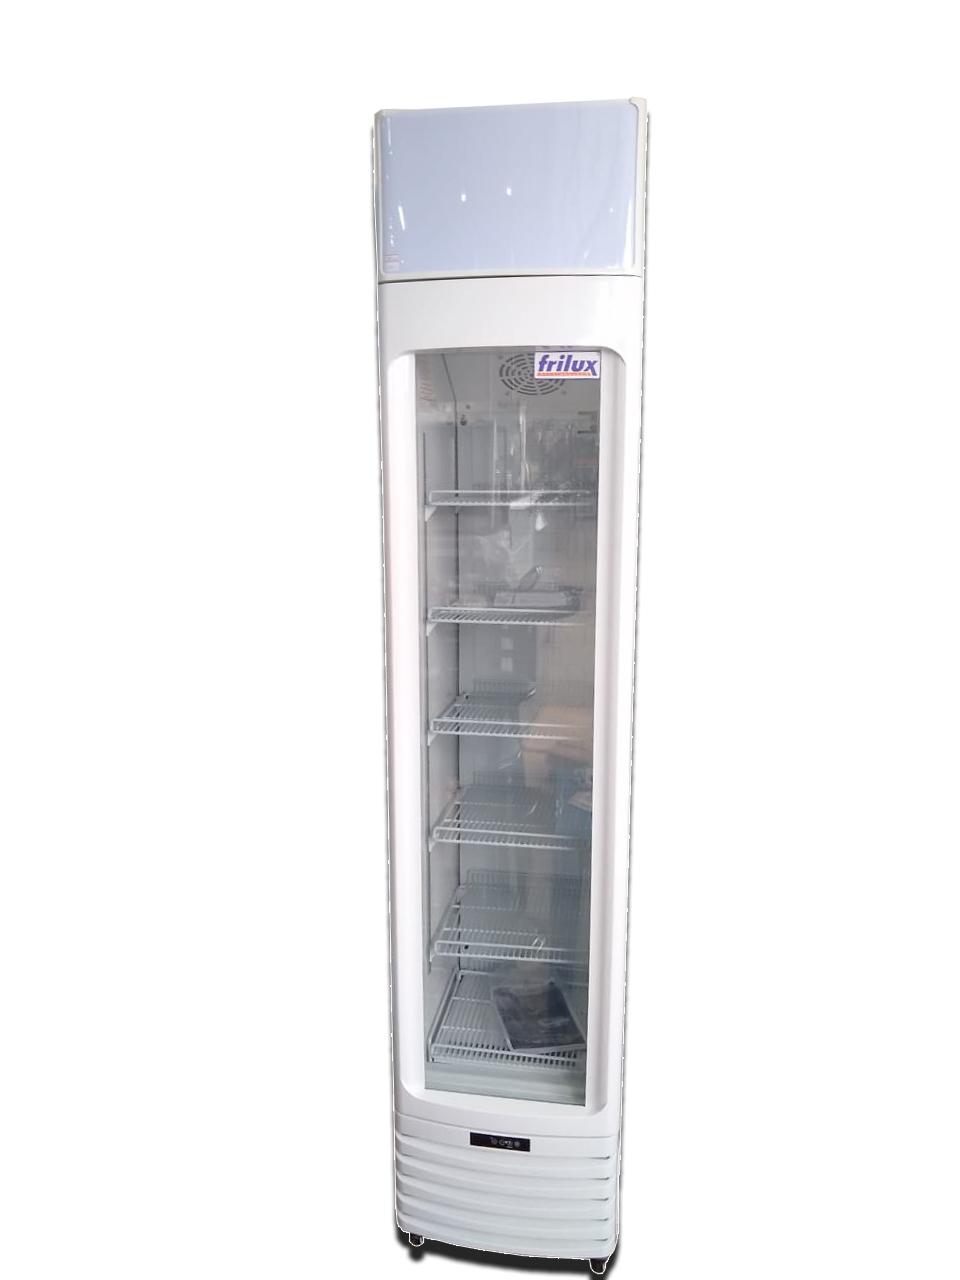 Expositor Visa-Cooler porta de vidro capacidade 150l branco 220V RF-003-ST Frilux